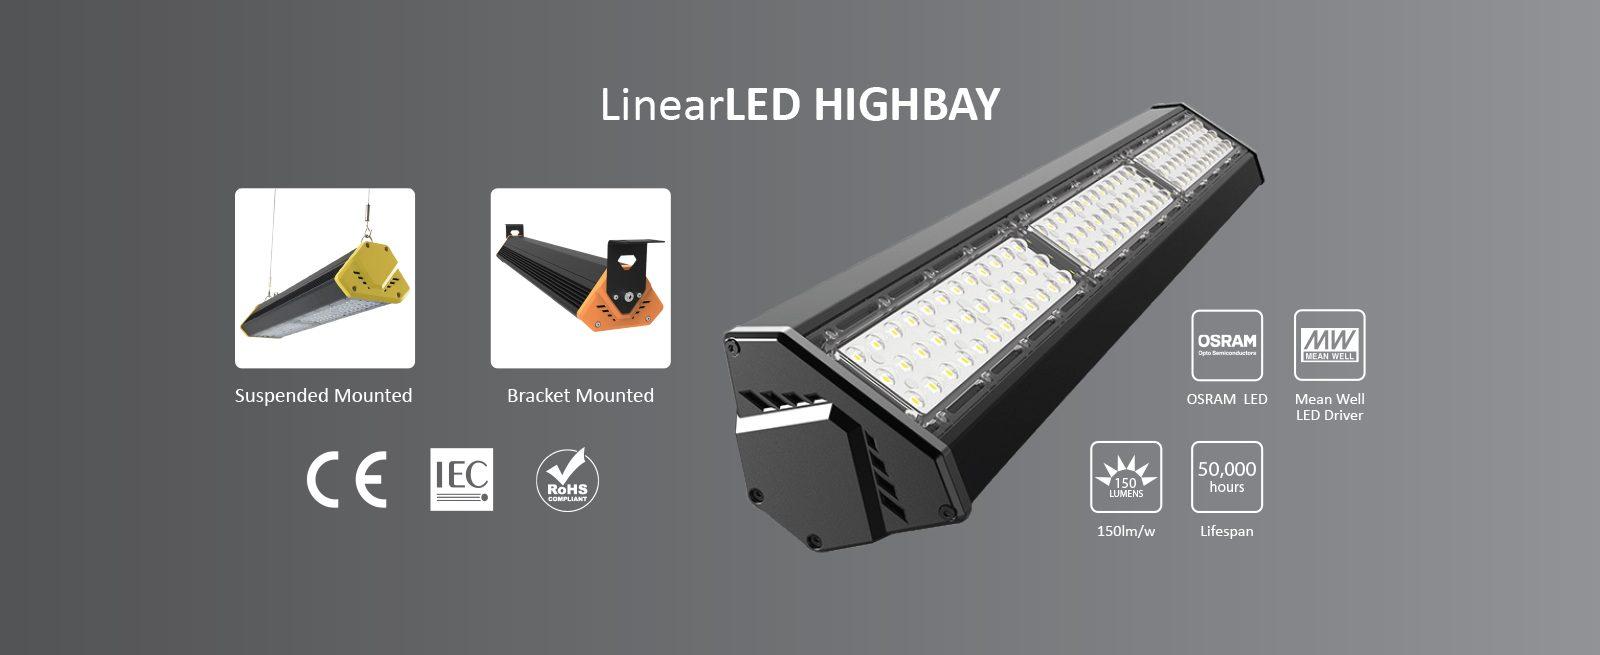 LinearLED Highbay